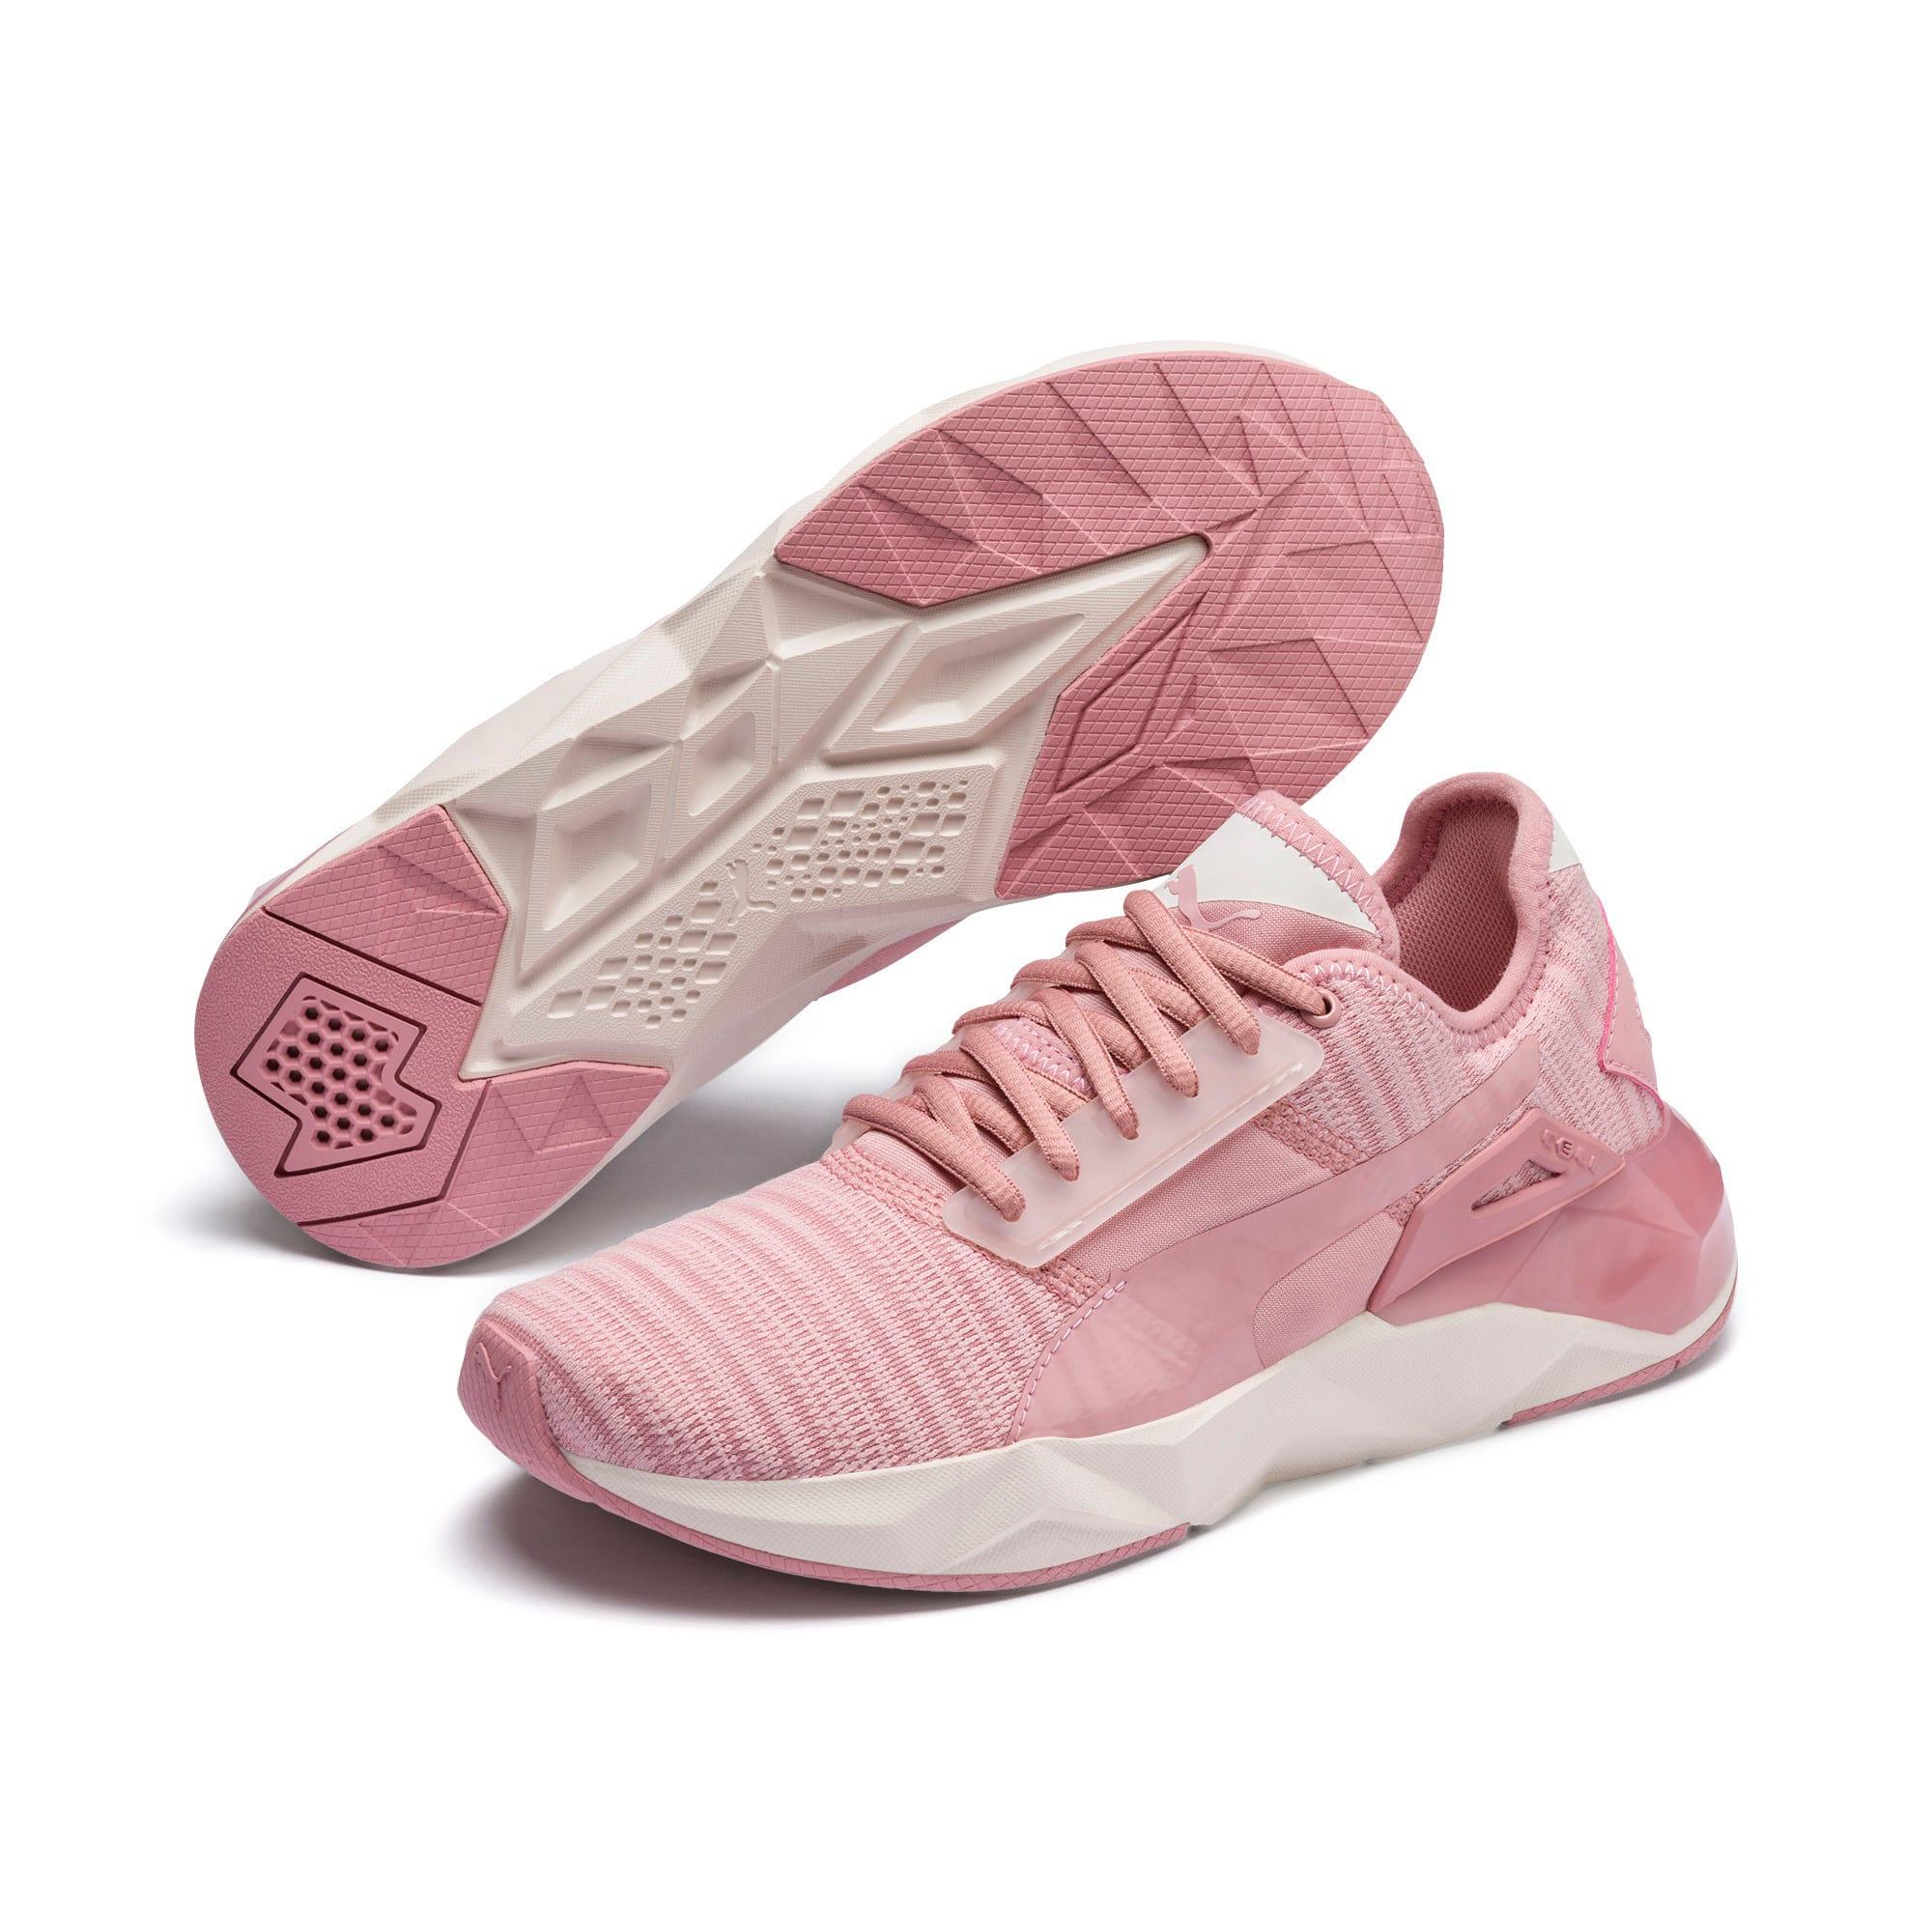 Thumbnail 3 of CELL Plasmic Women's Training Shoes, Bridal Rose-Pastel Parchment, medium